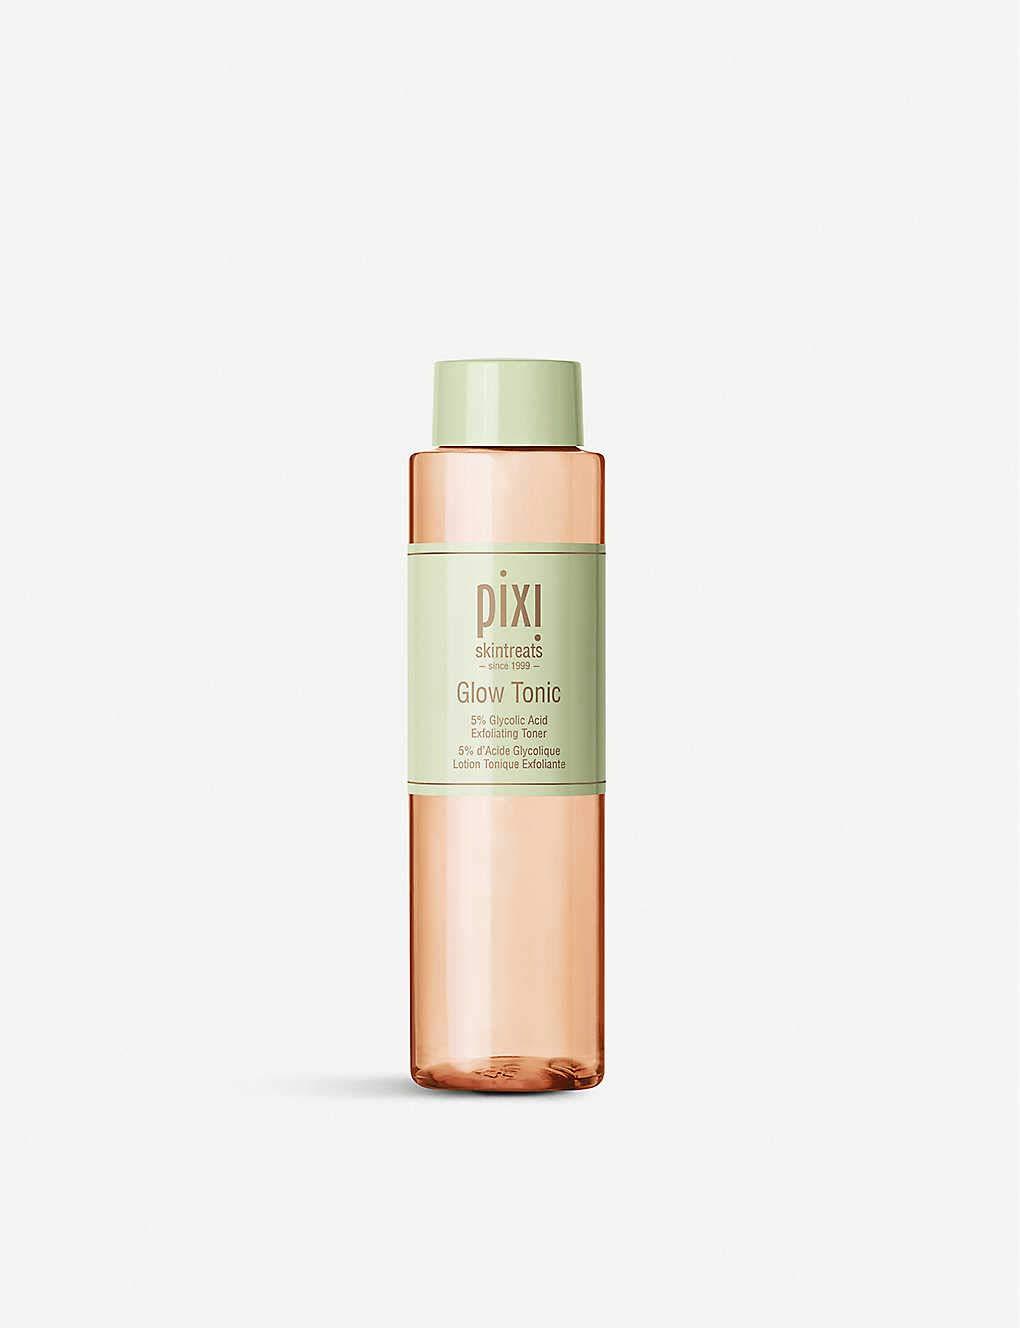 Pixi Glow Tonic with Aloe Vera & Ginseng, 8 oz